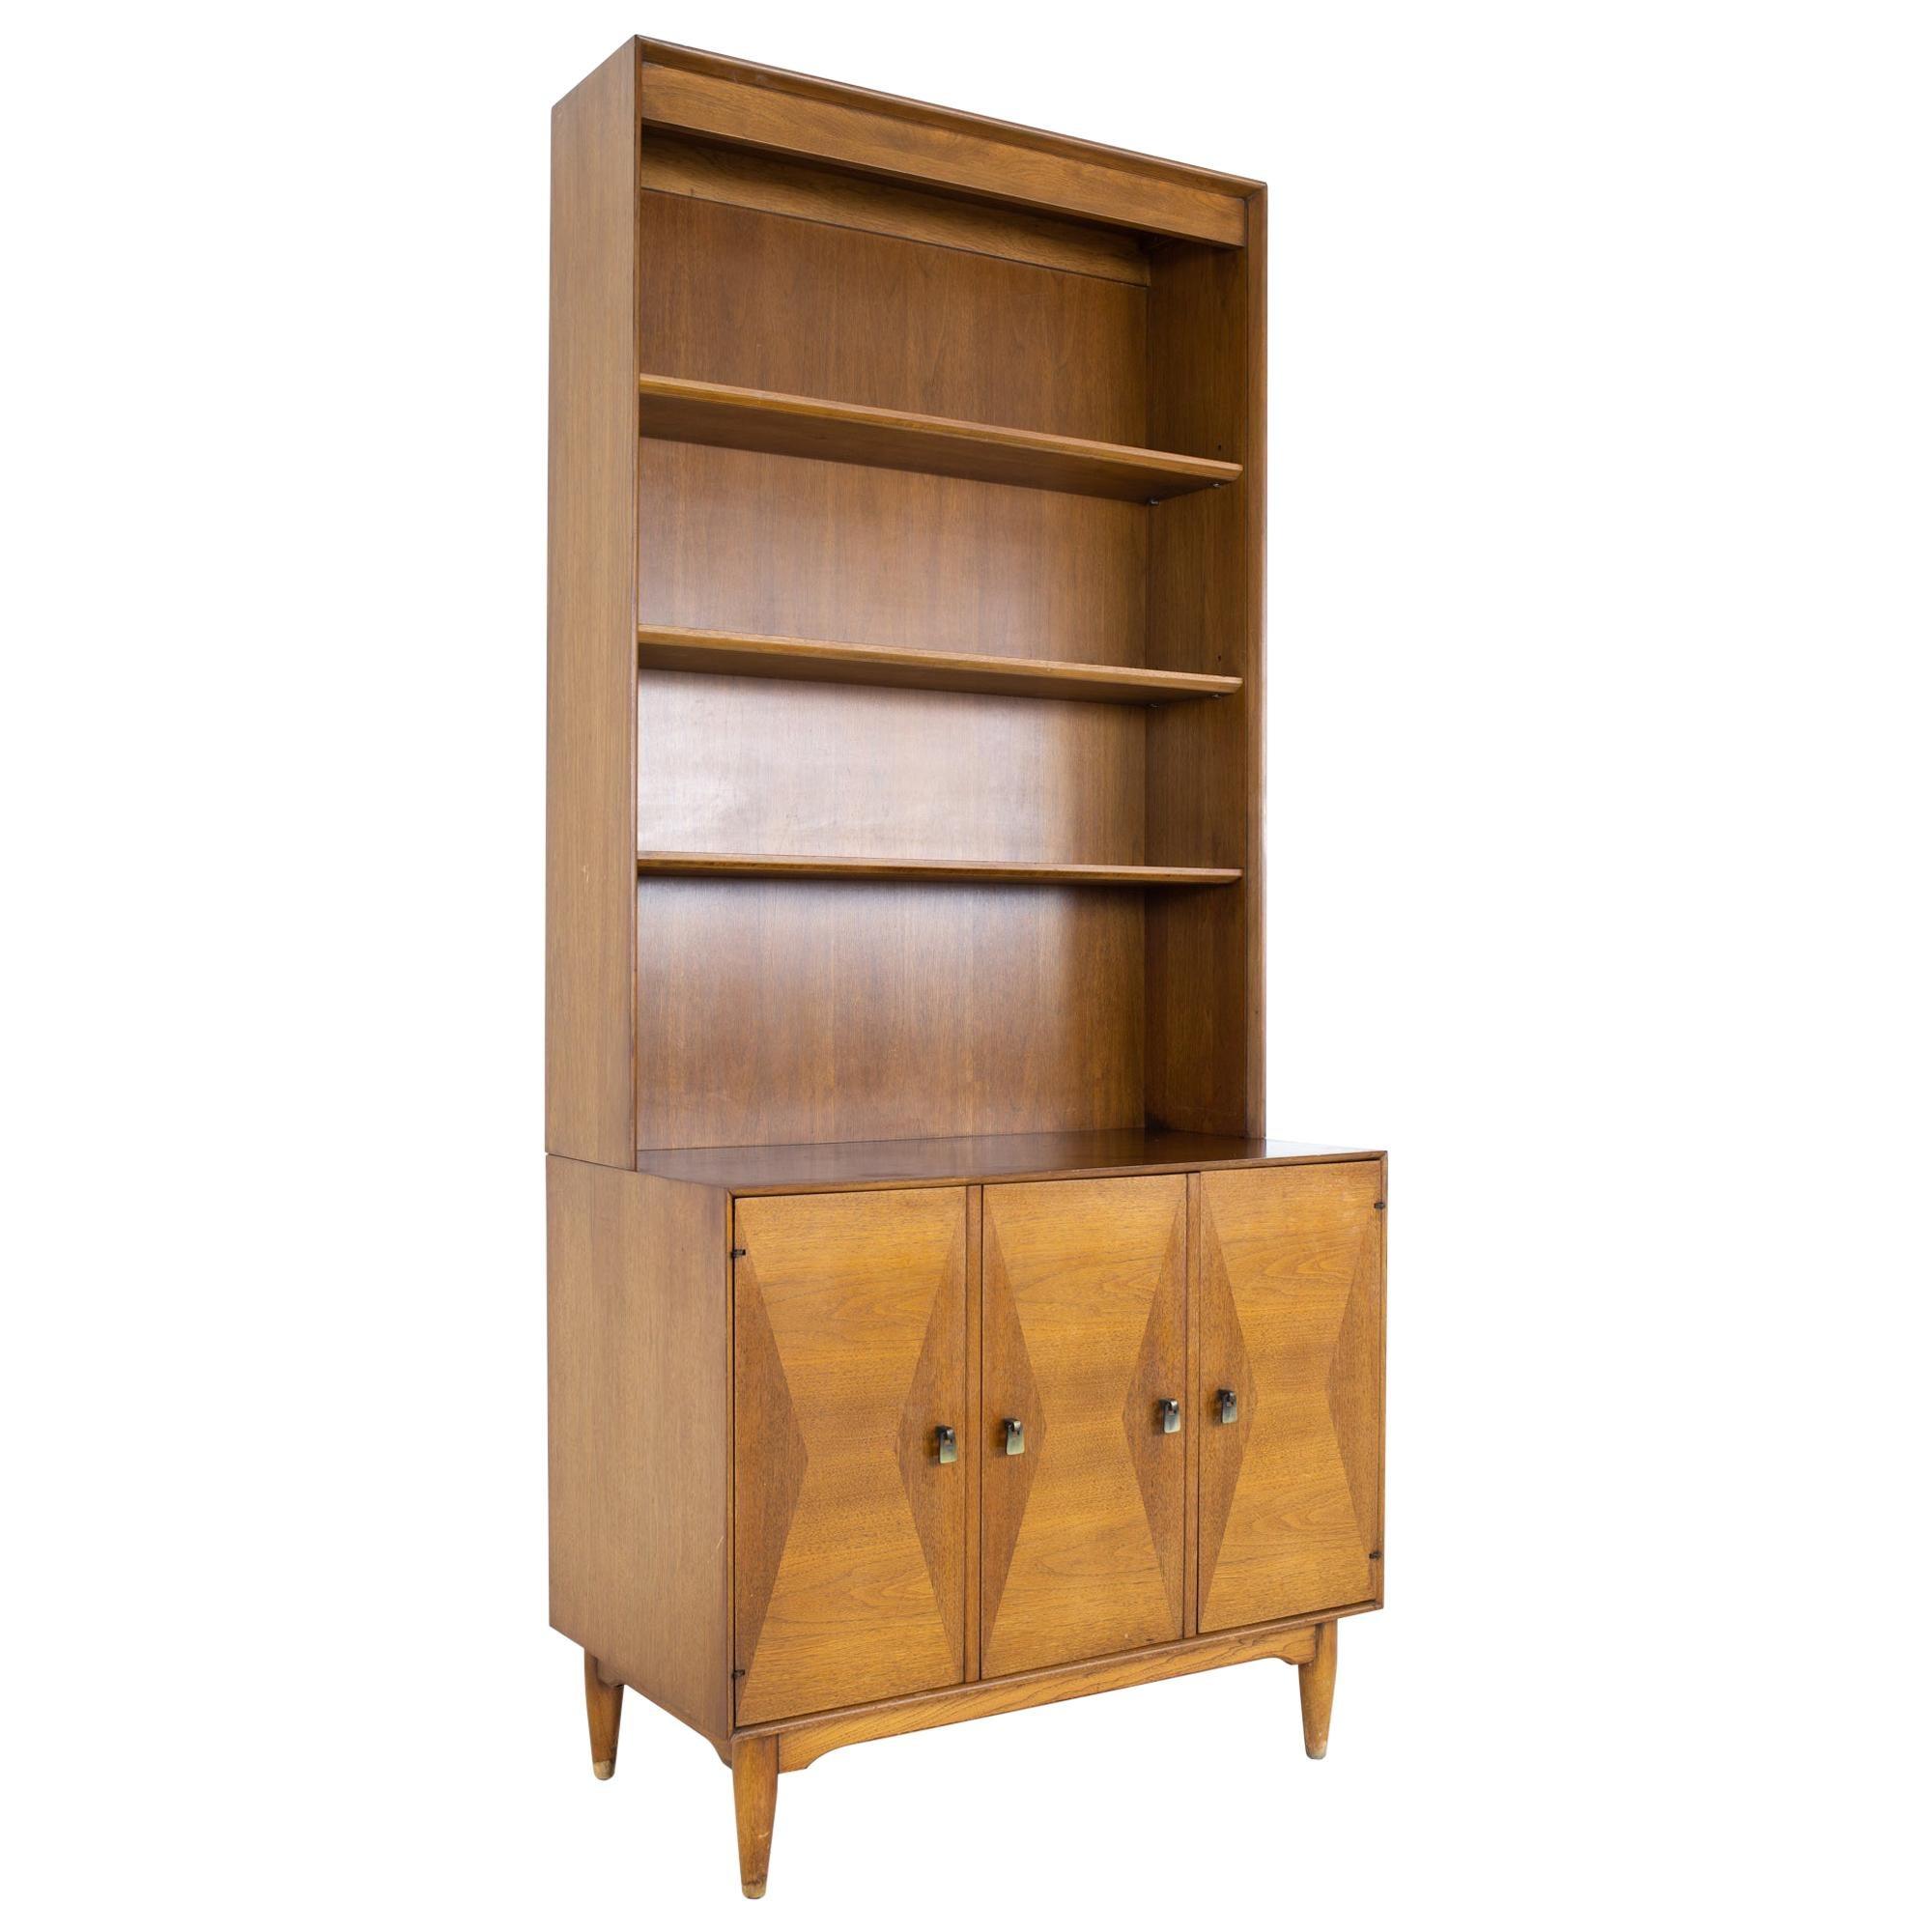 Ramseur MCM Inlaid Walnut Thin Bookcase Sideboard Credenza Buffet and Hutch